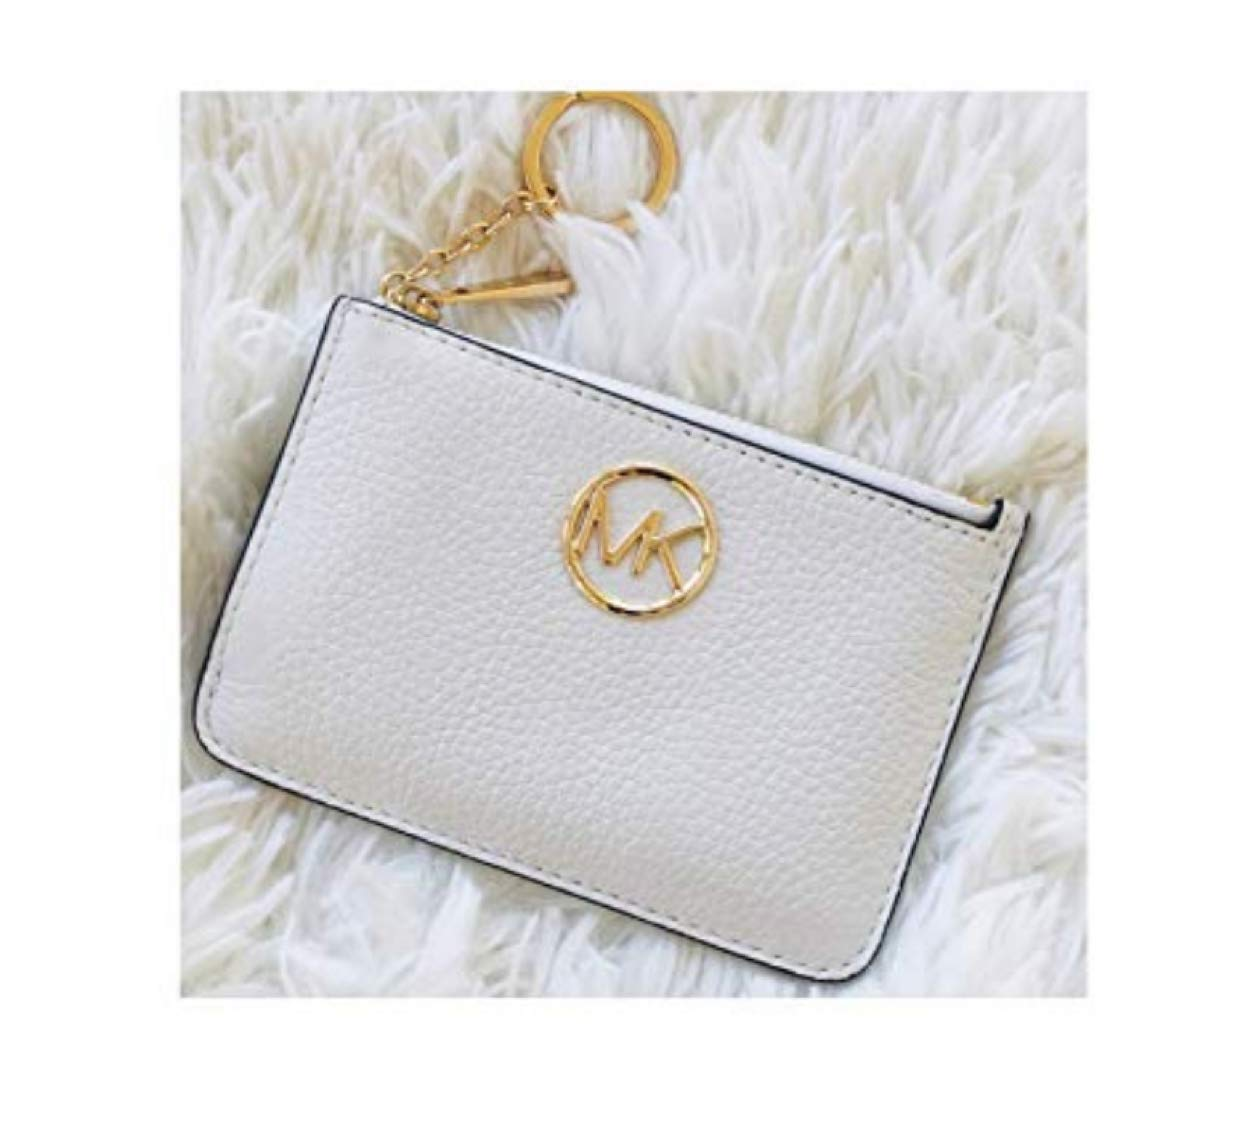 Michael Kors Fulton Small Coin Pouch Mini Wallet Key Chain White by Michael Kors